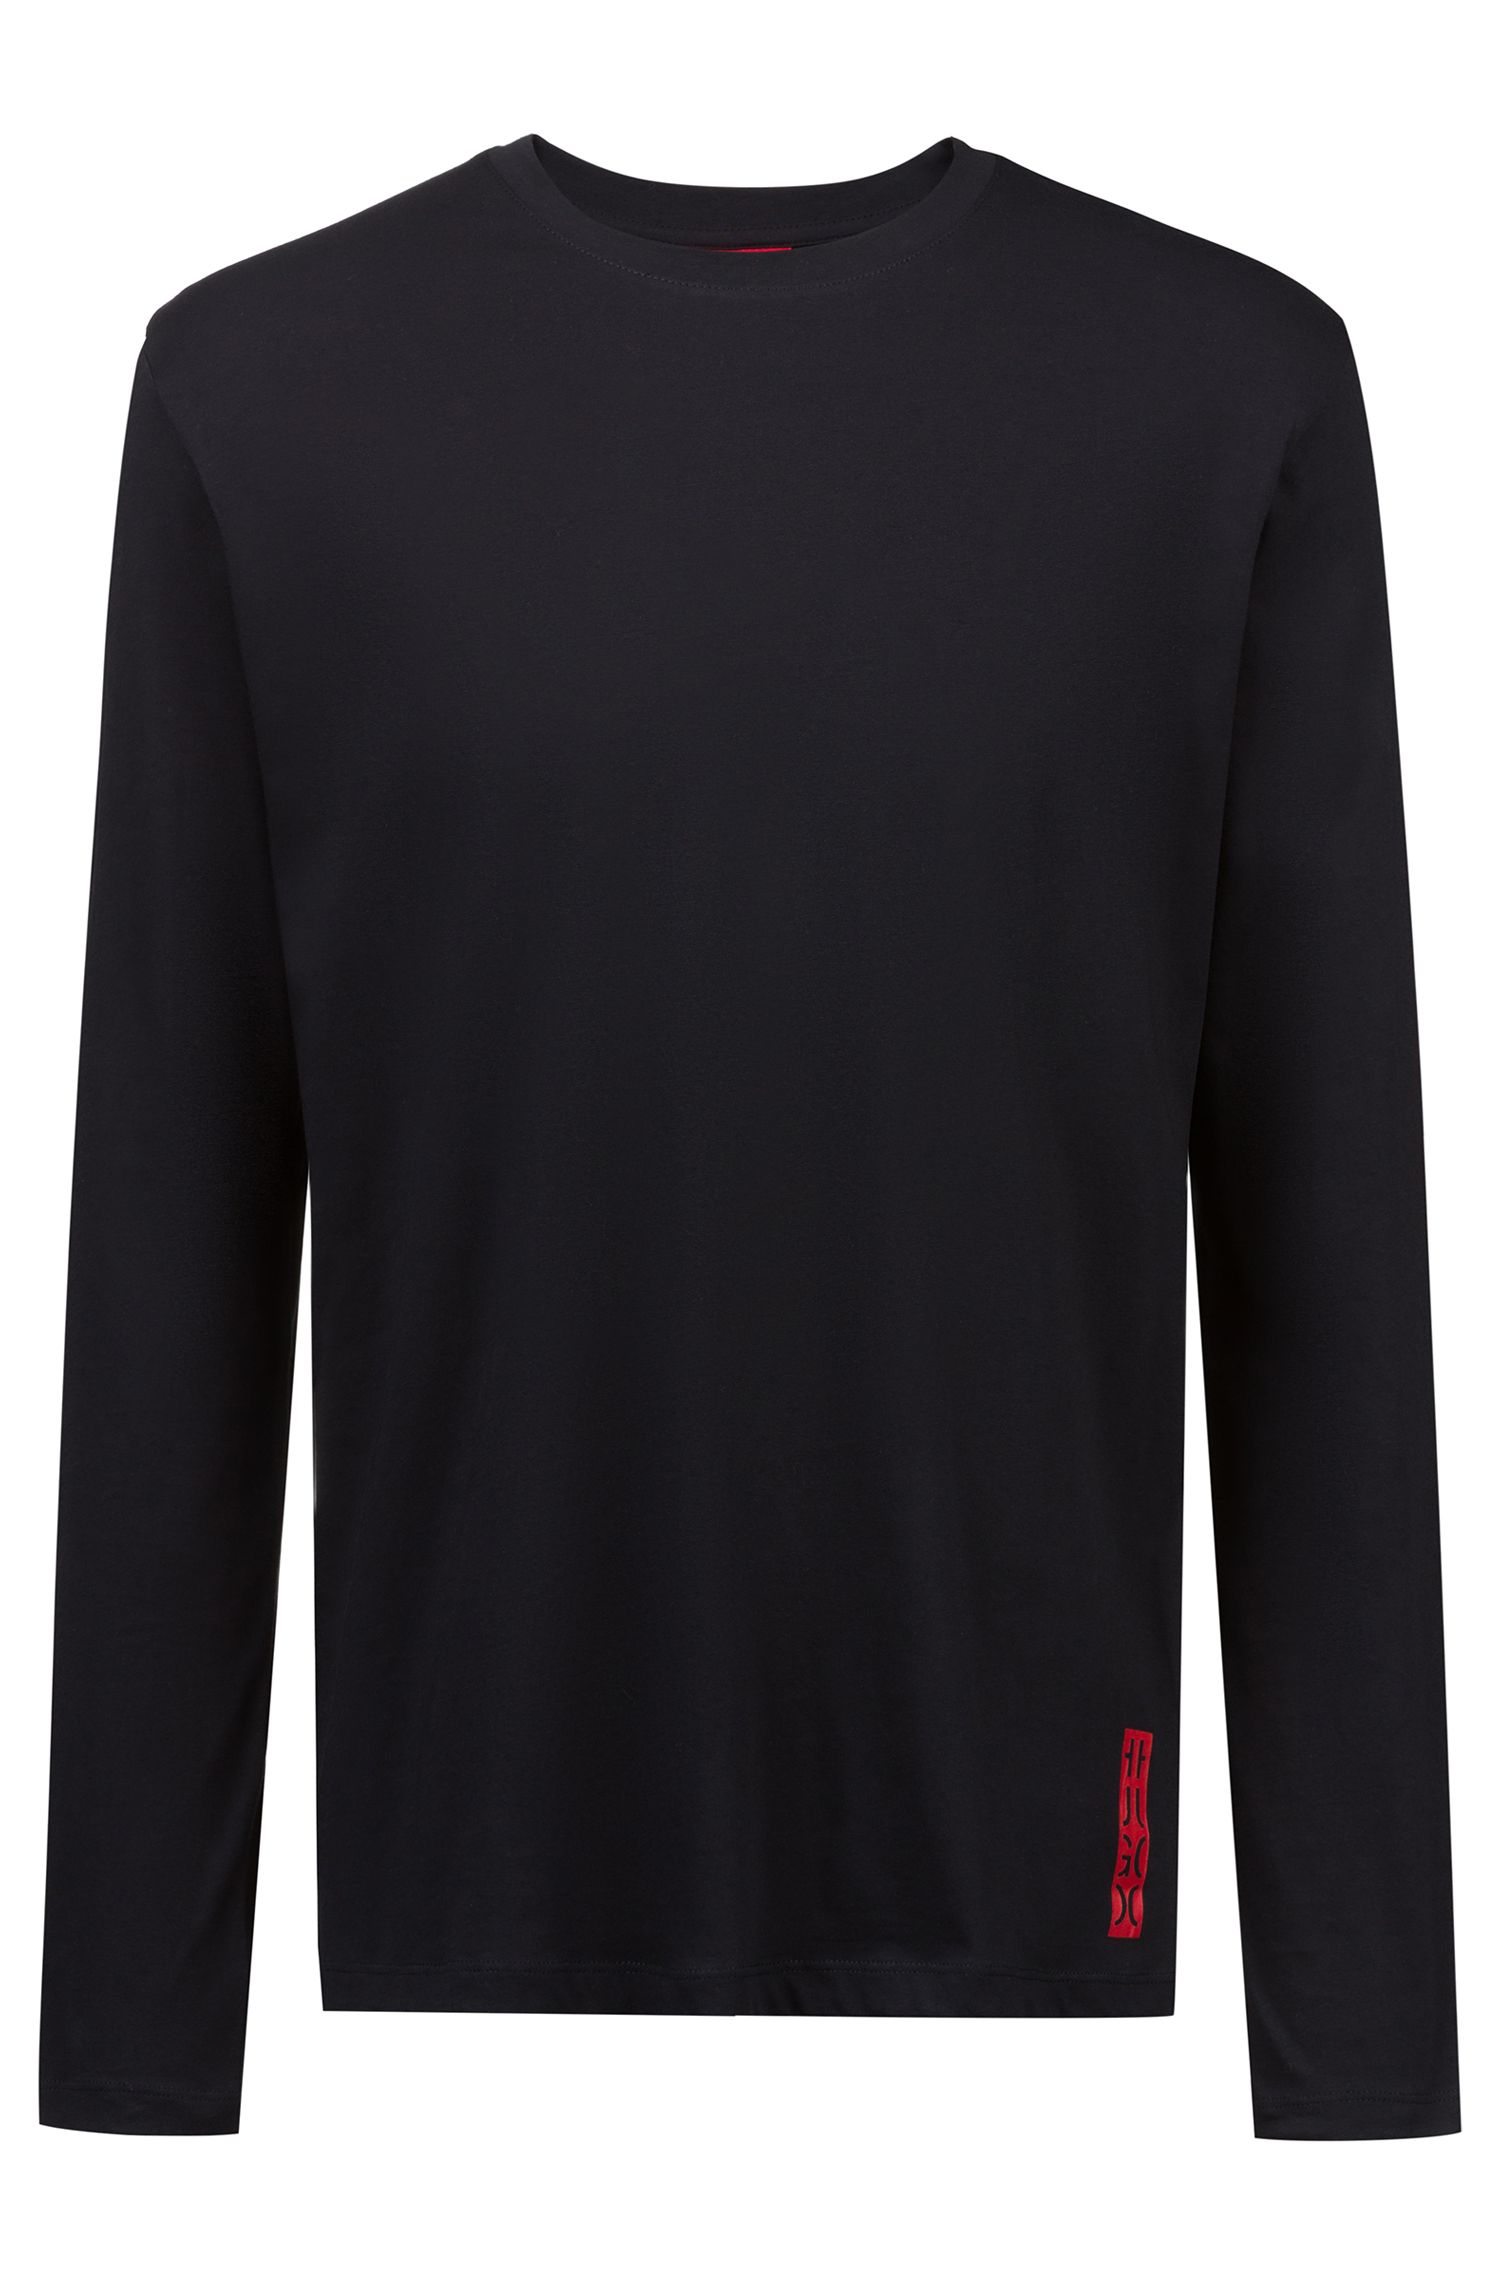 Camiseta relaxed fit de manga larga con gráfico inspirado en nuestro logo, Negro